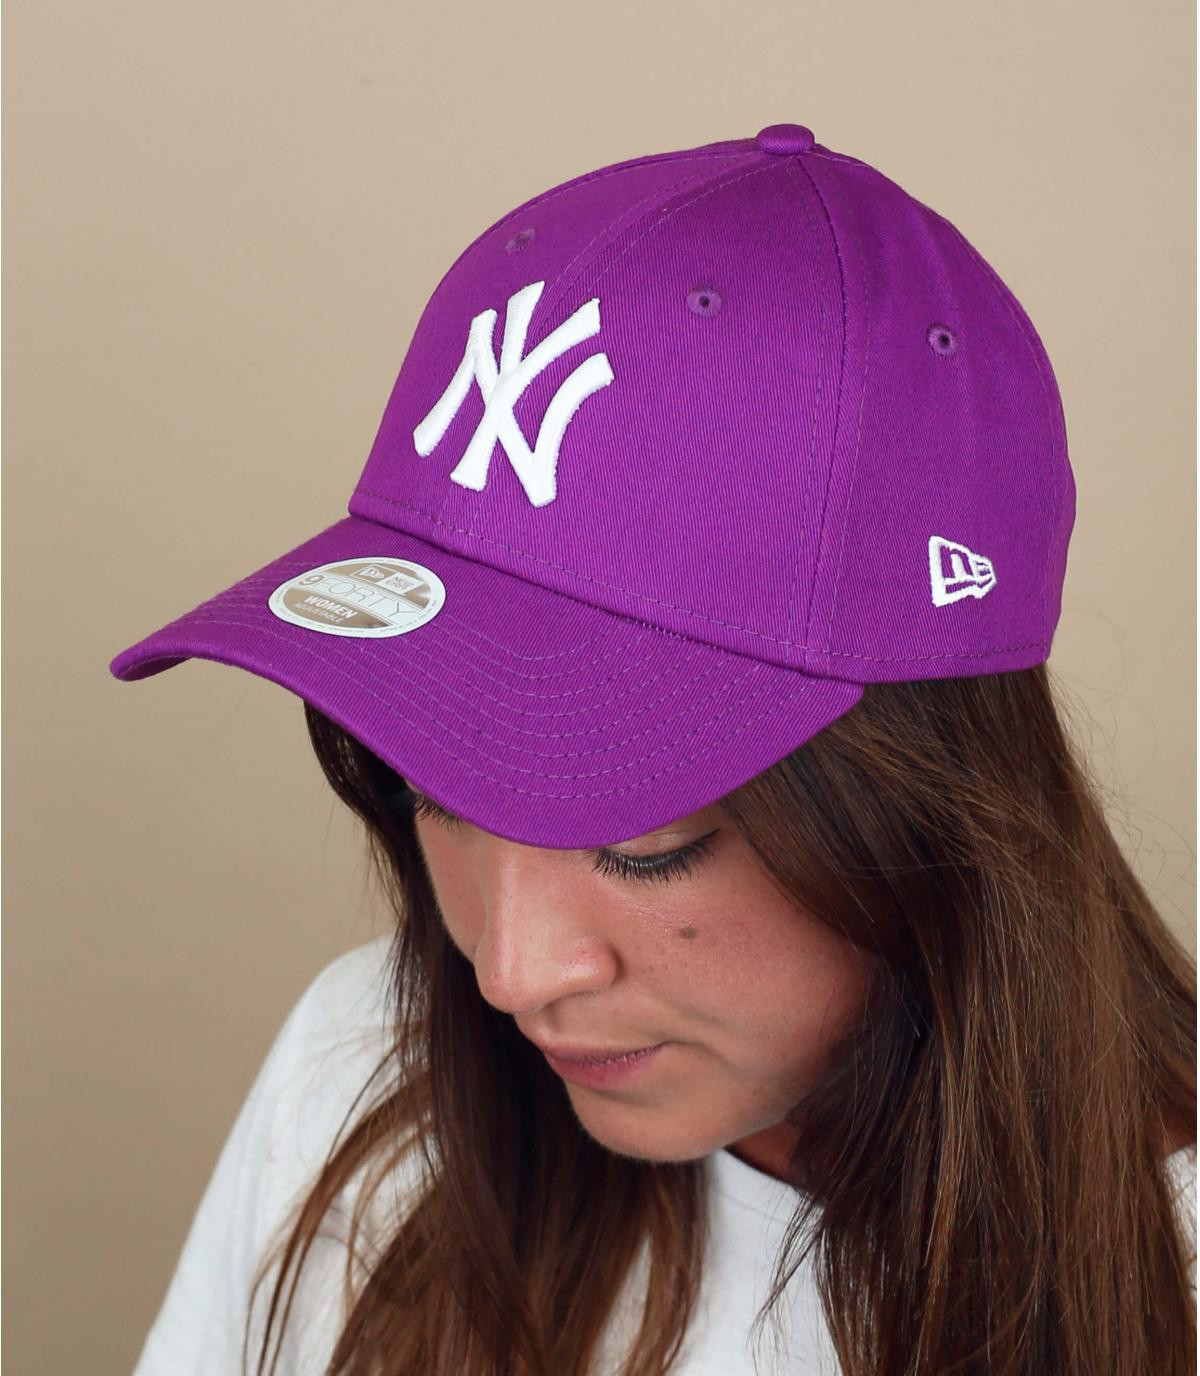 casquette NY femme violet